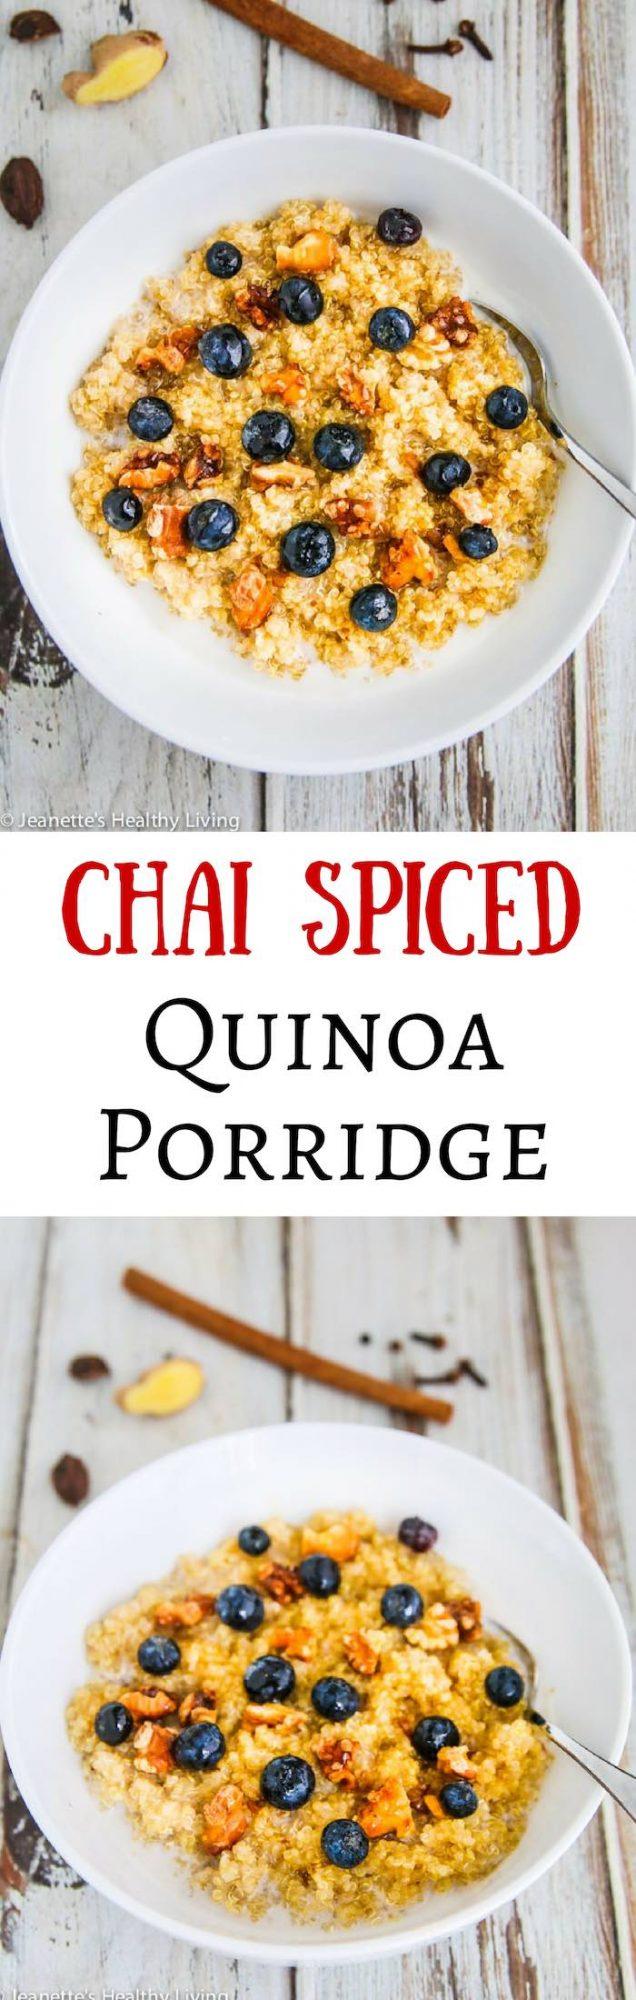 Chai Spiced Quinoa Porridge - scented with cinnamon, cloves, cardamon, ginger and black pepper